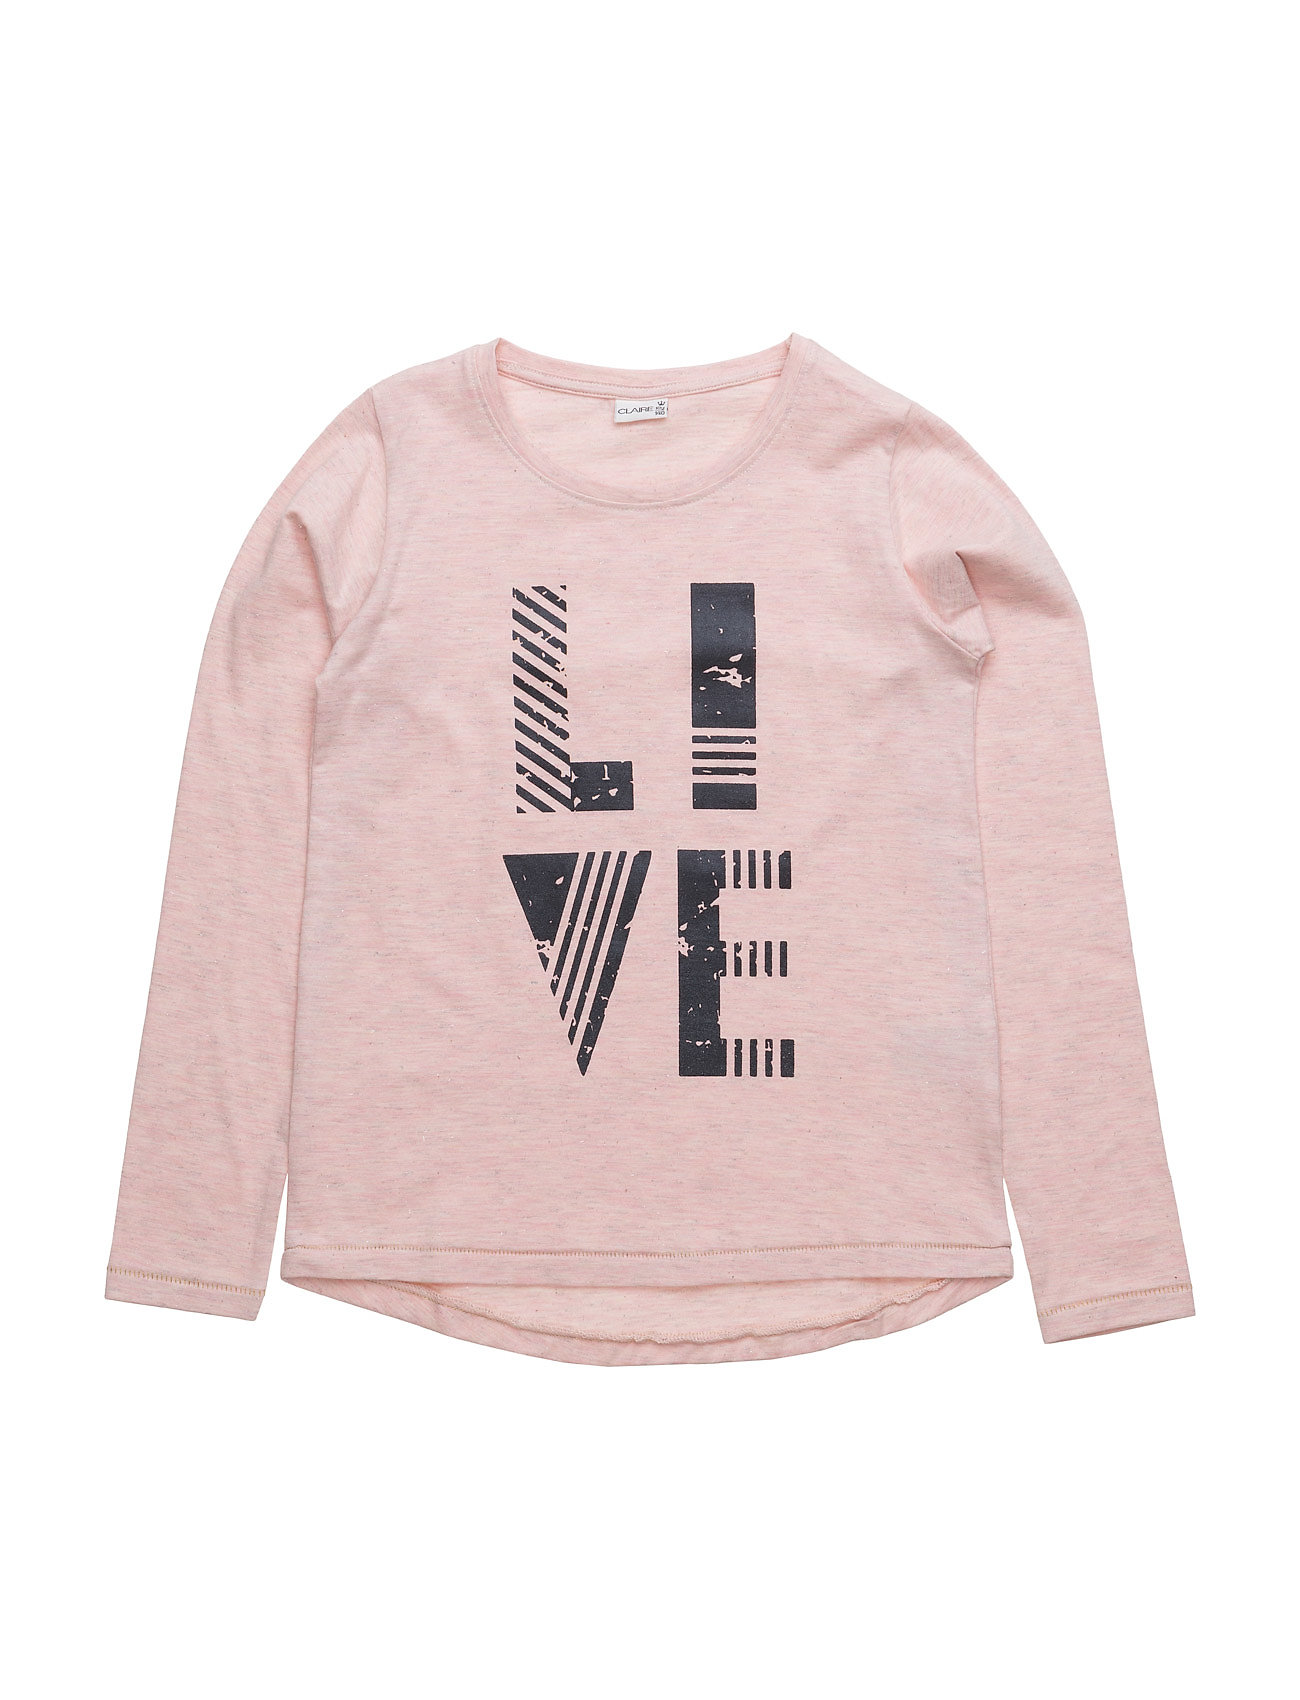 T-Shirt L/S Hust & Claire T-shirts til Piger i